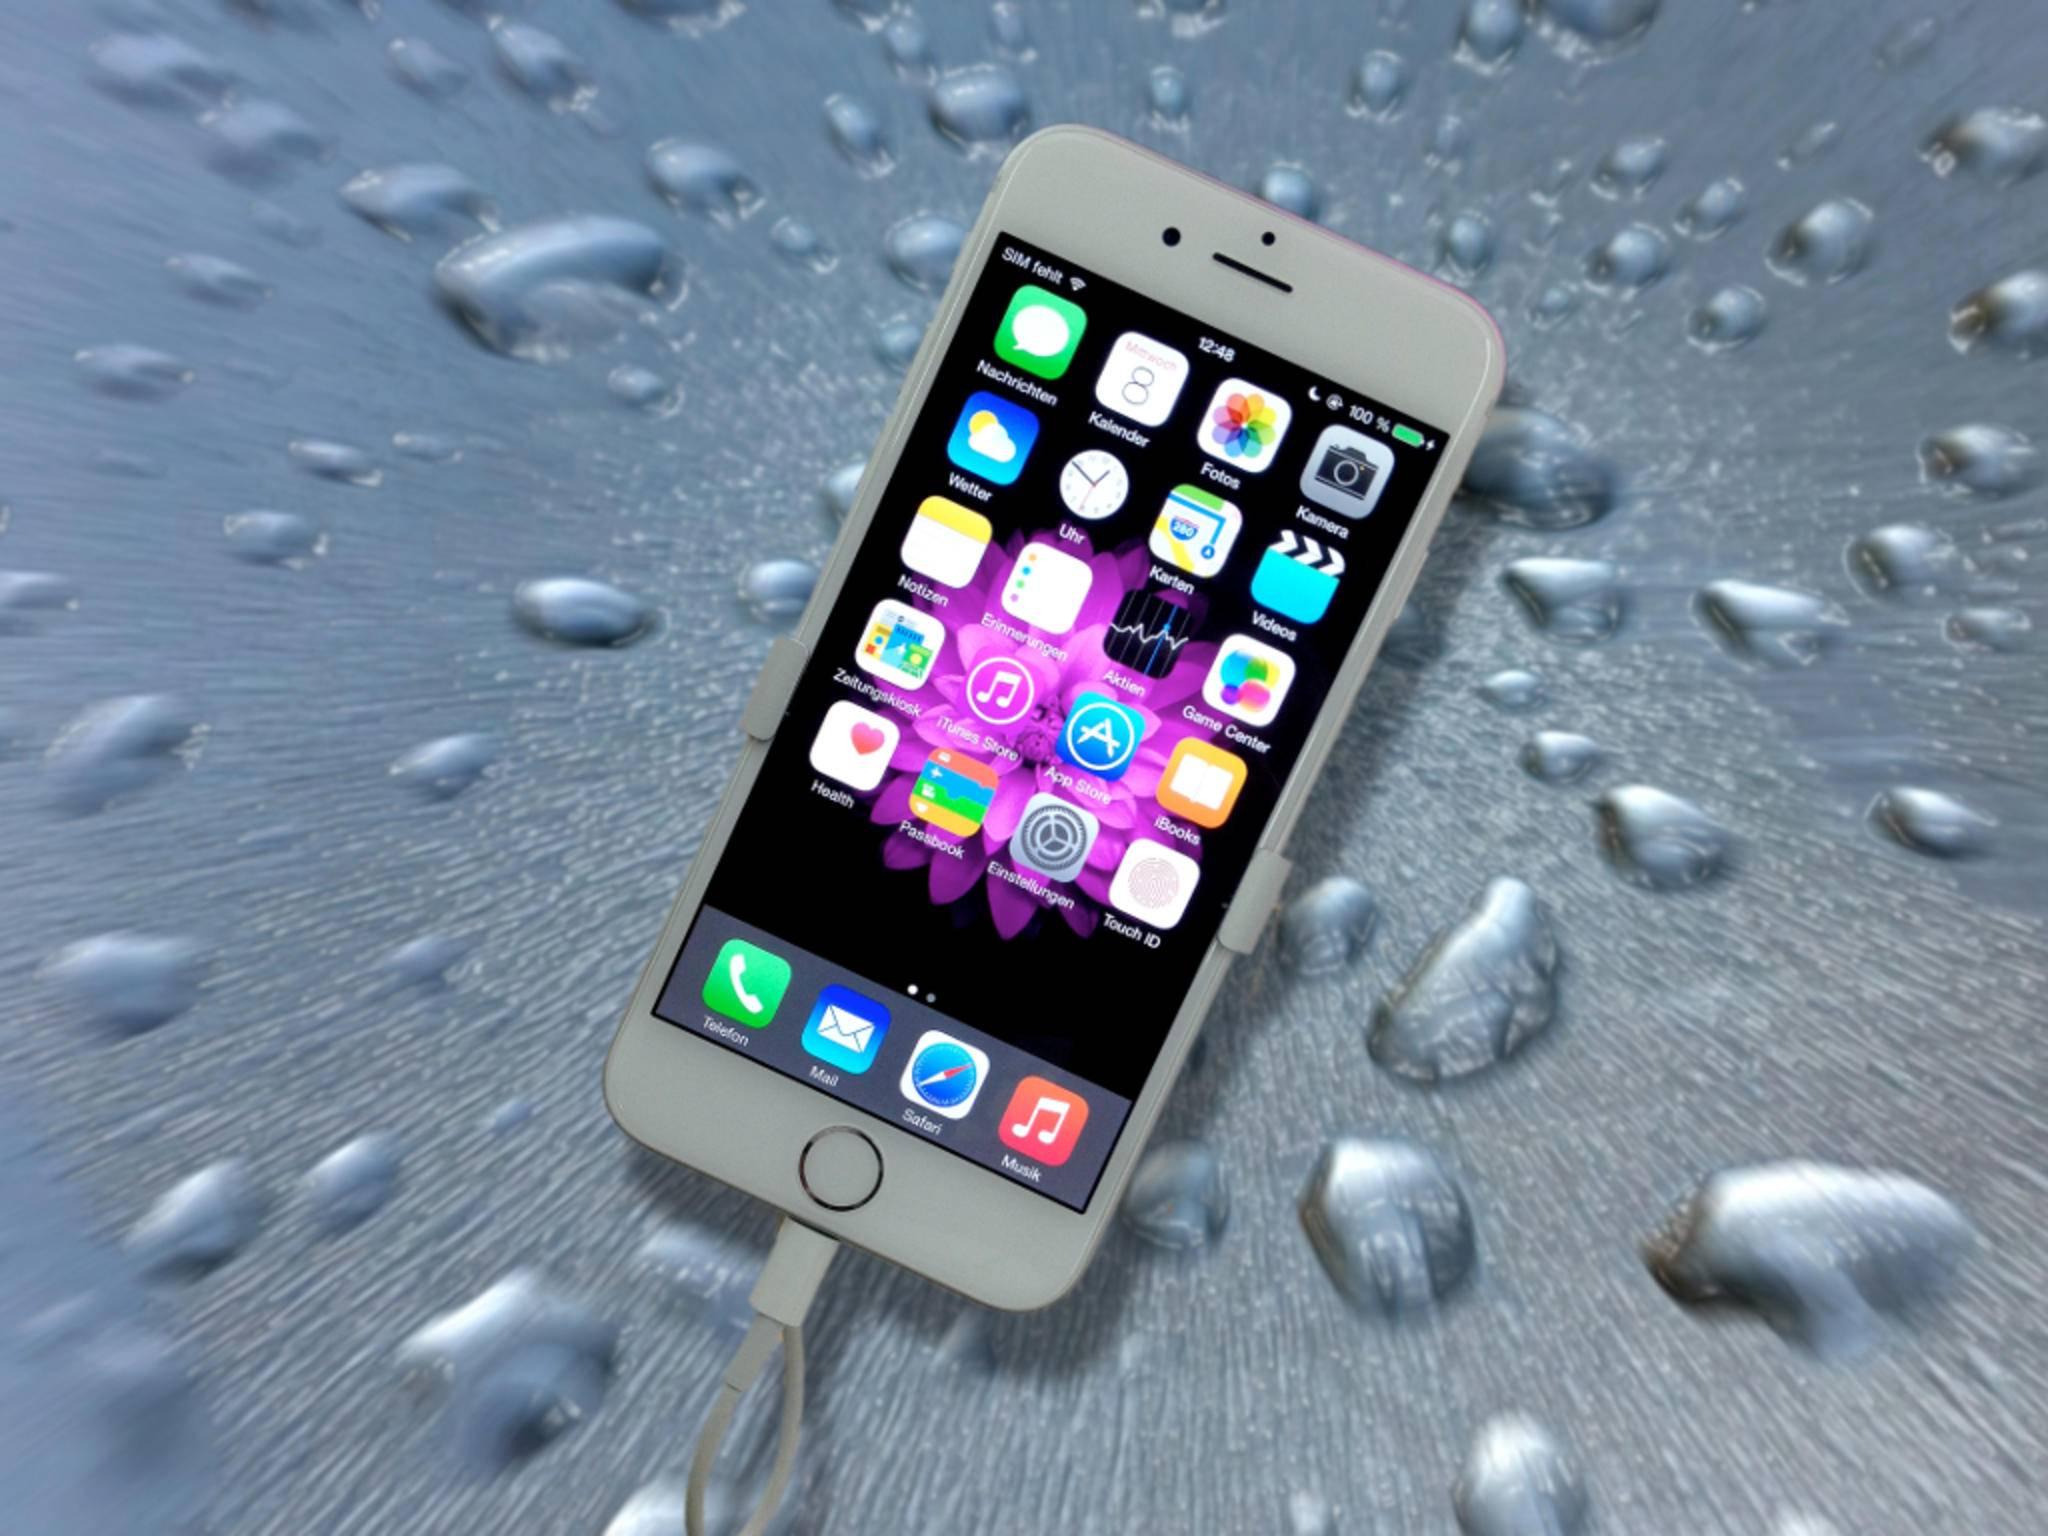 Das Apple iPhone 6 mit dem Betriebssystem iOS 8